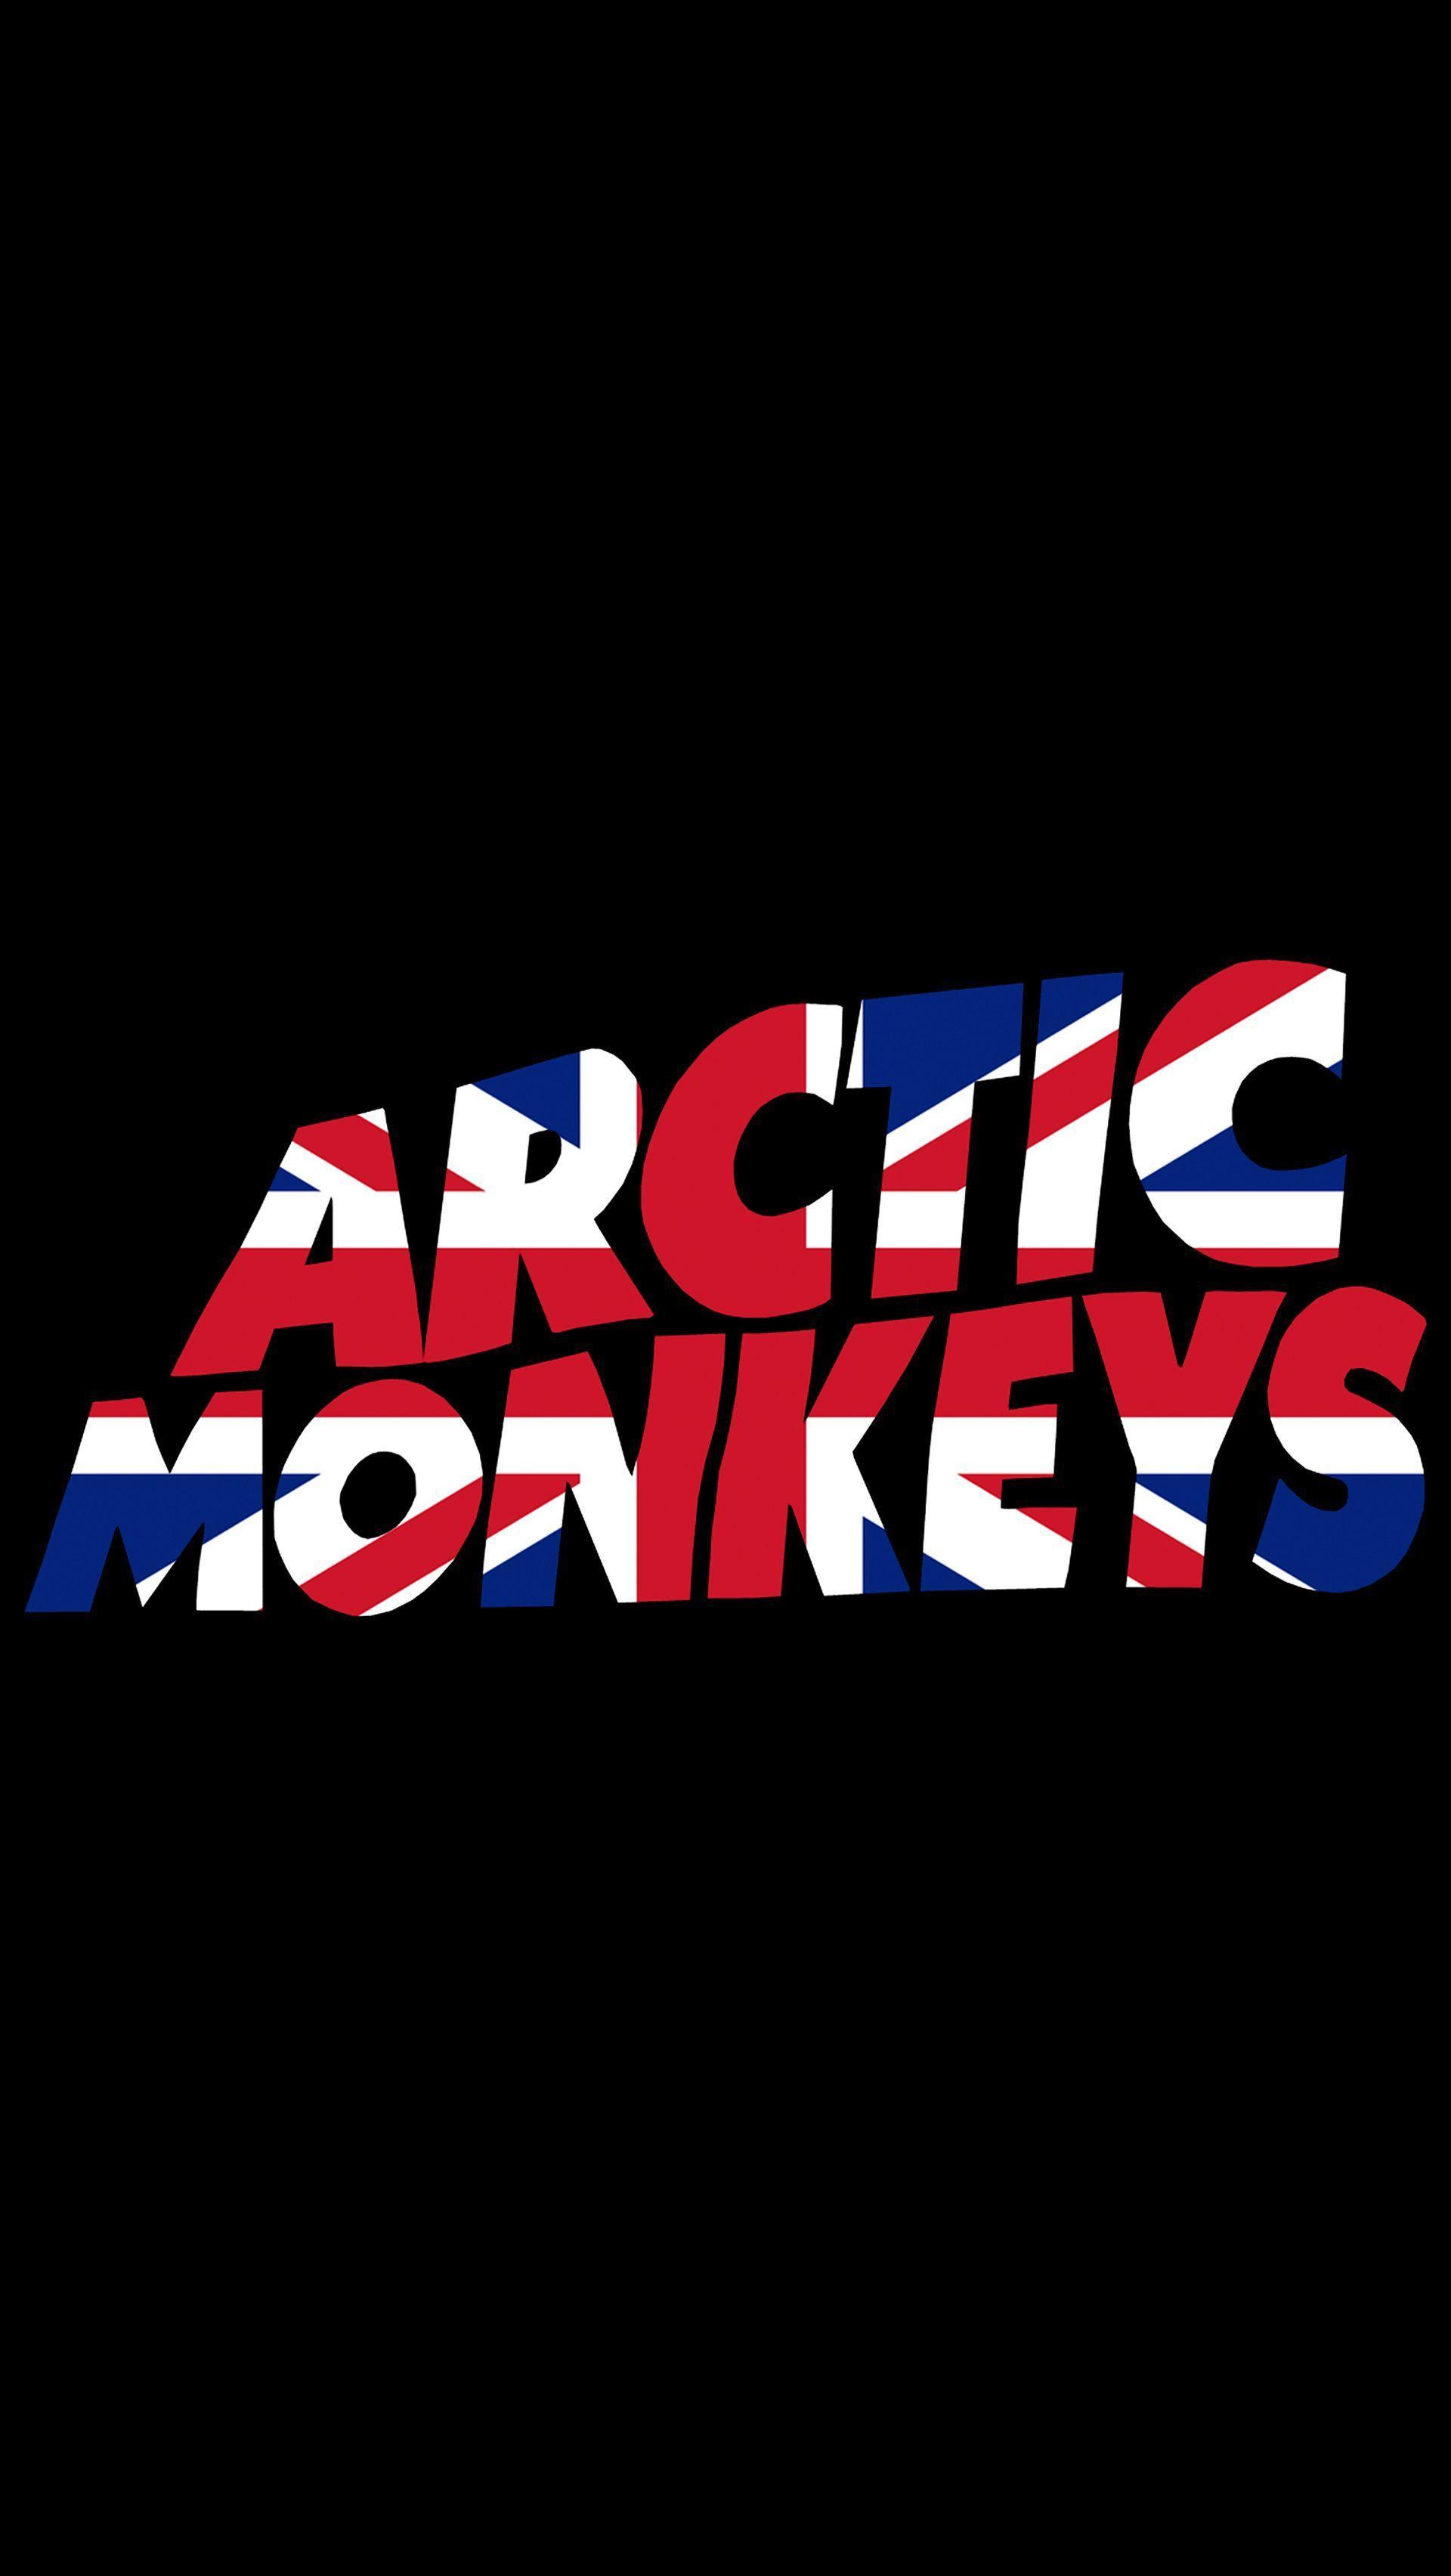 arctic monkeys wallpapers top free